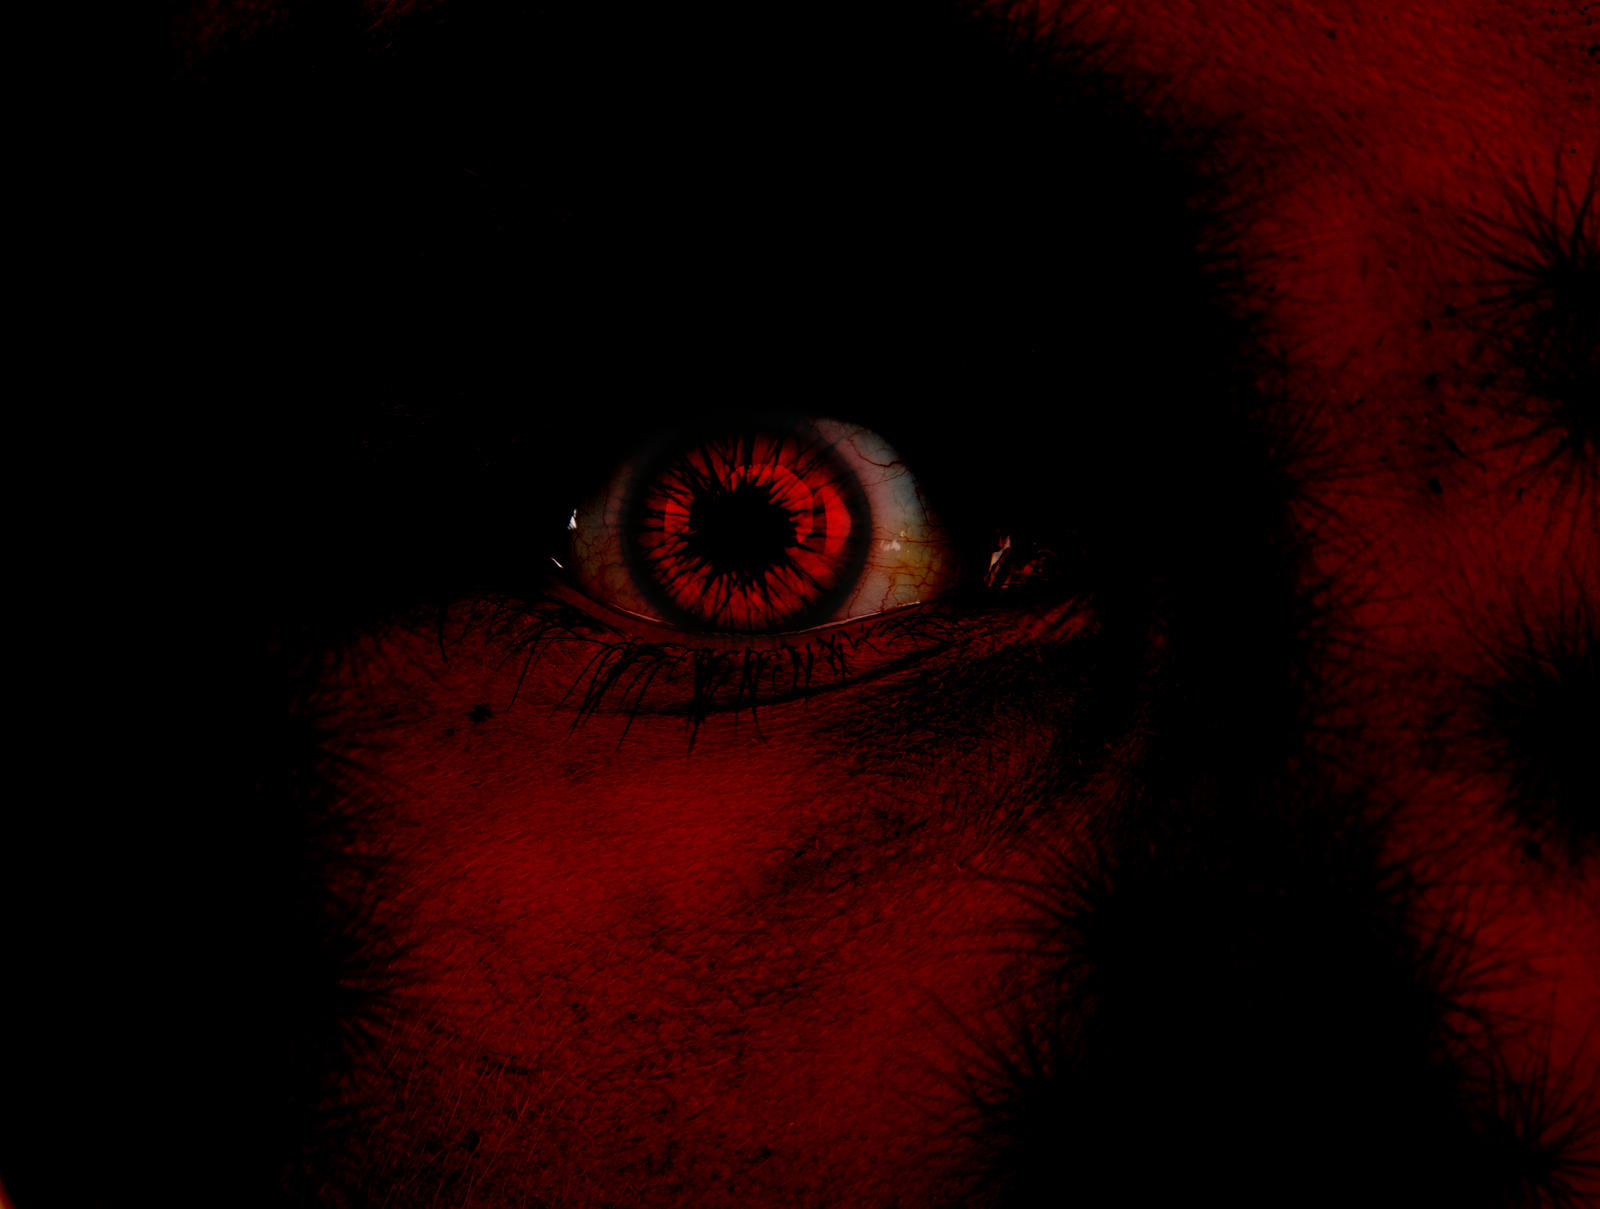 Macabre eye by jan222 on DeviantArt